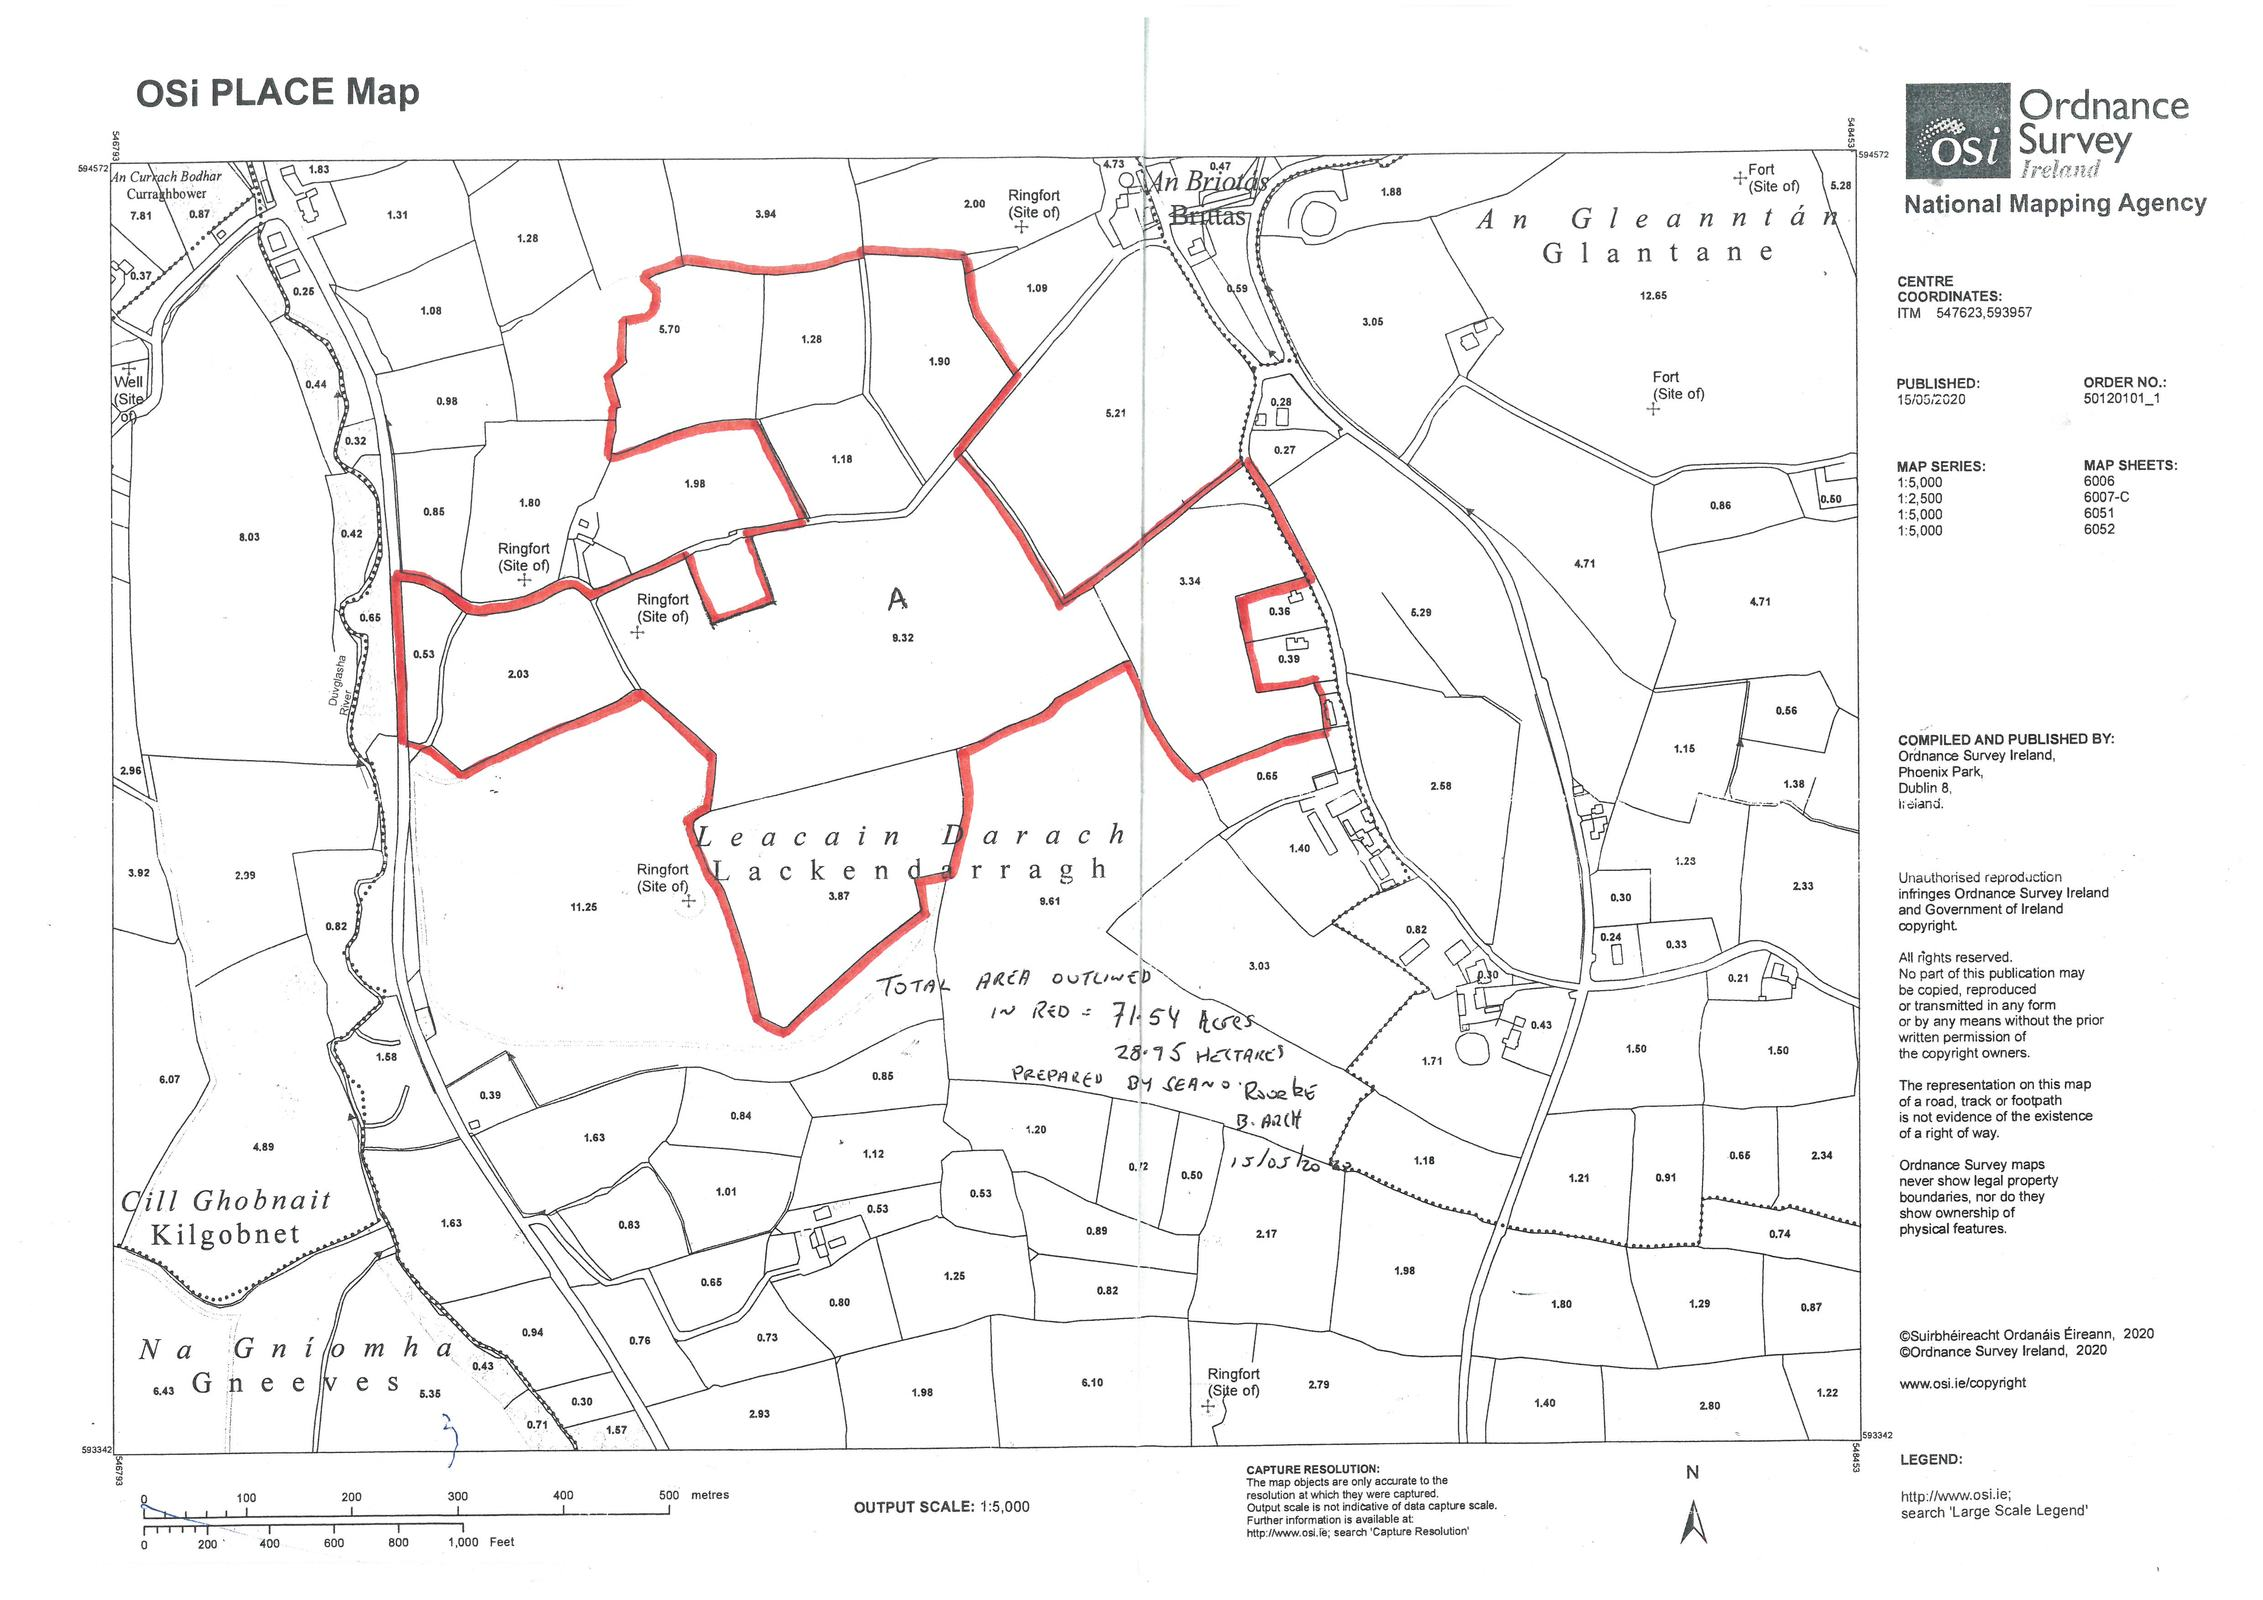 Lackendarragh, Glantane, Lombardstown, Co. Cork